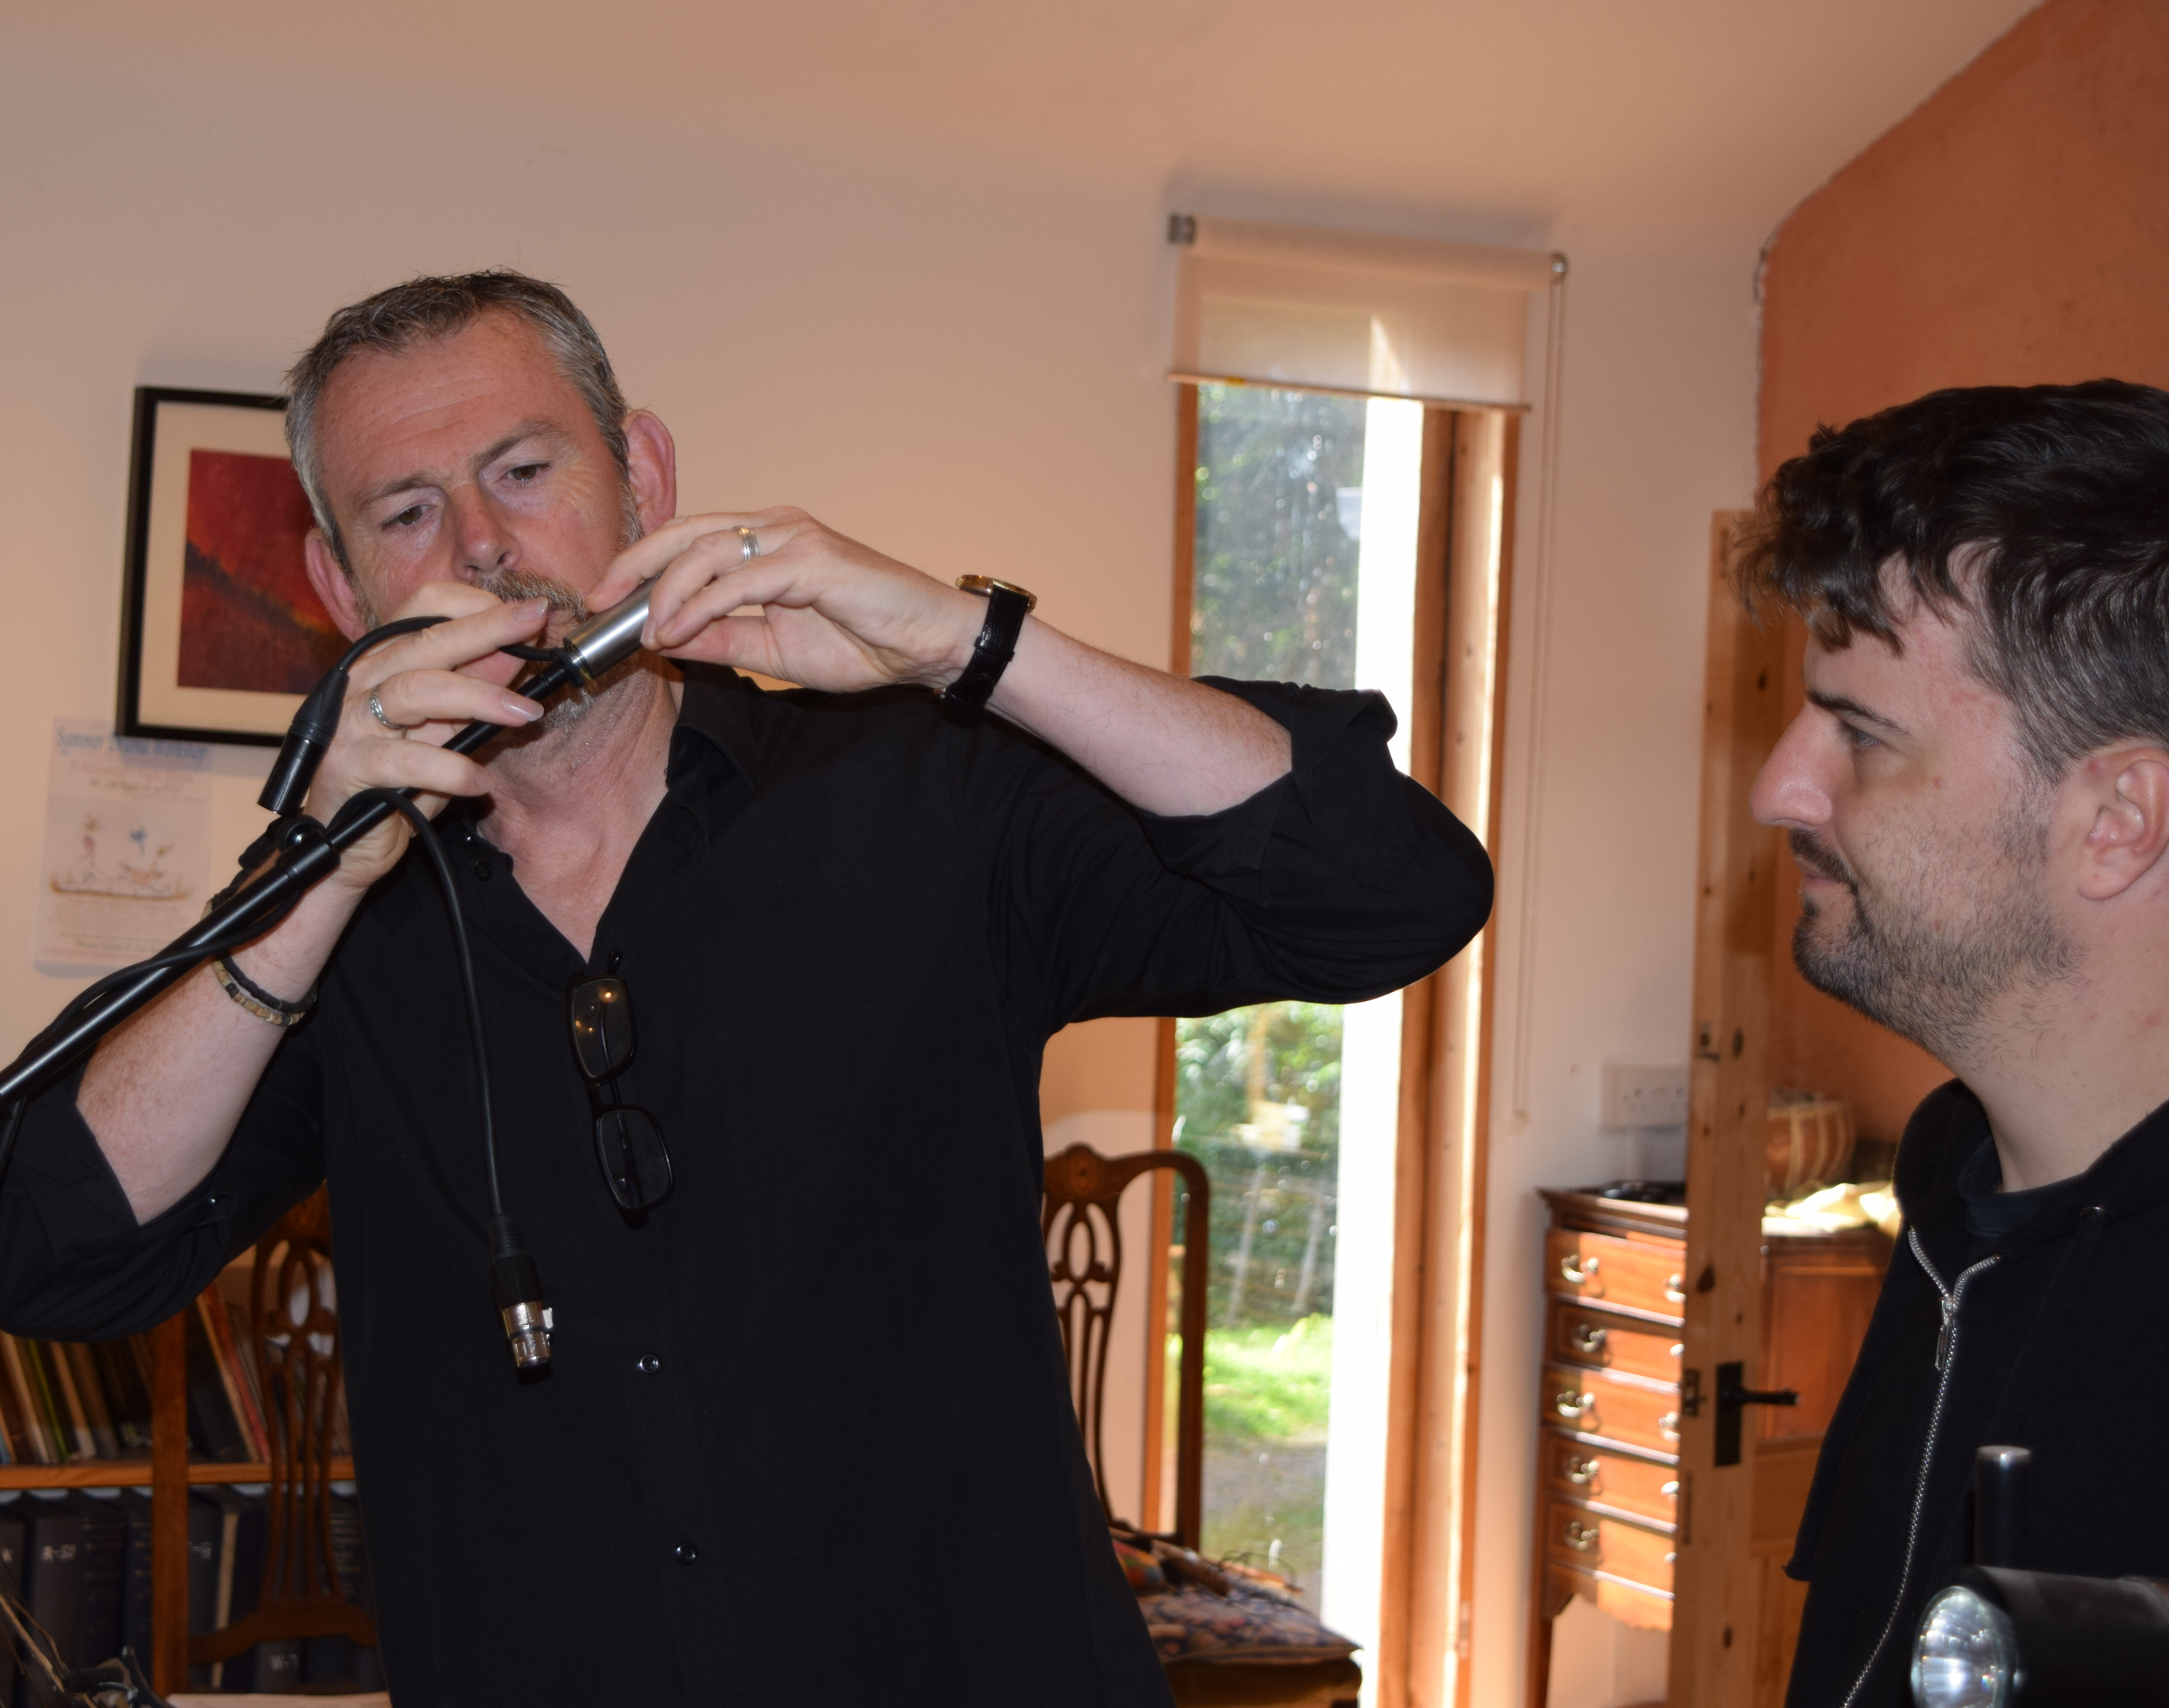 Dylan Fowler rigging mics